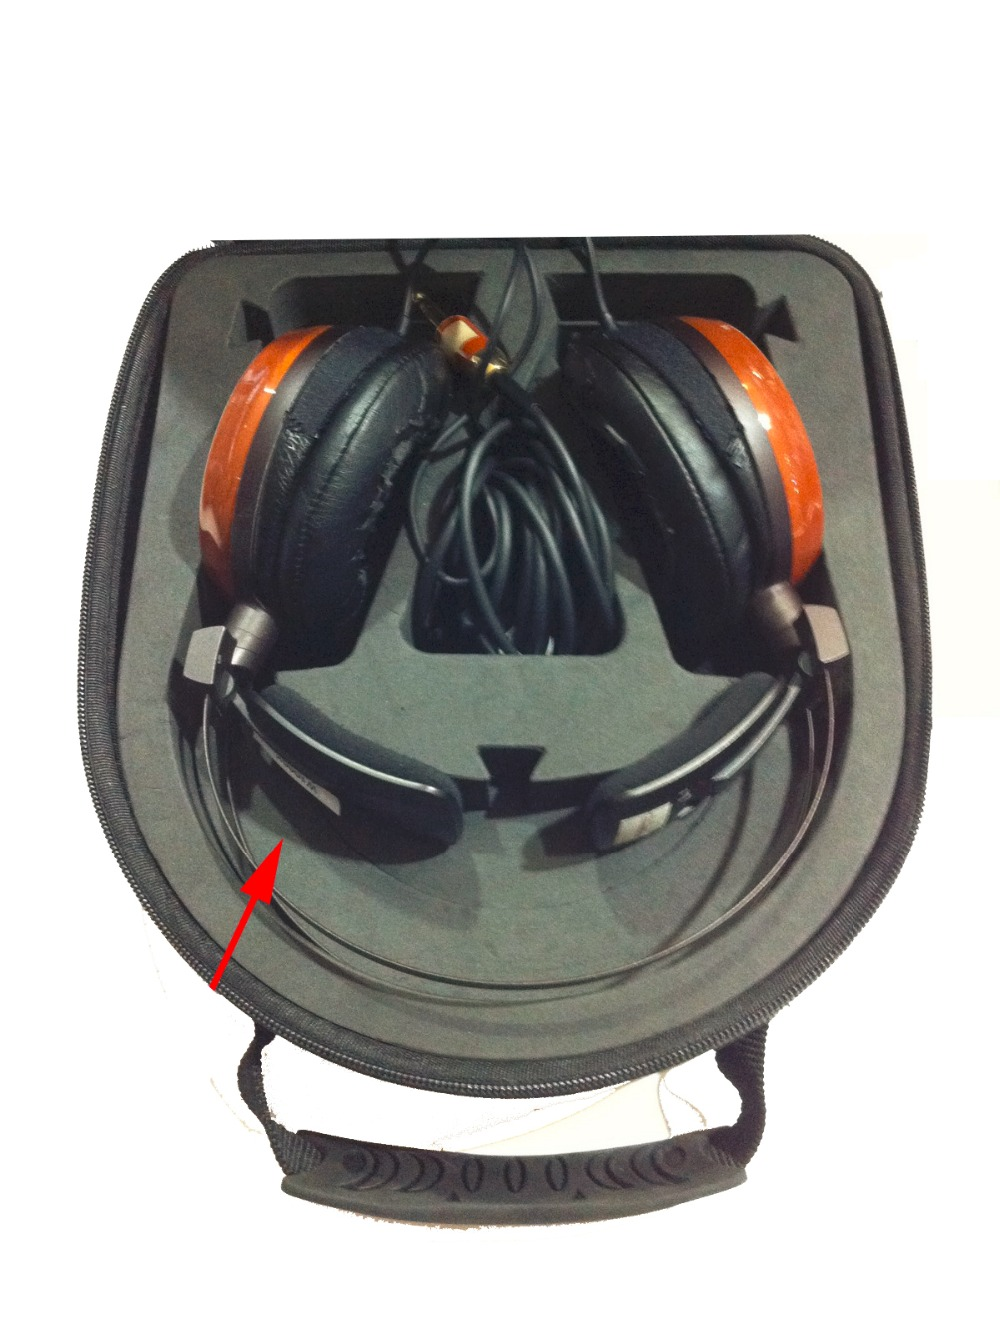 çantası V-MOTA Audio ATH-A900X